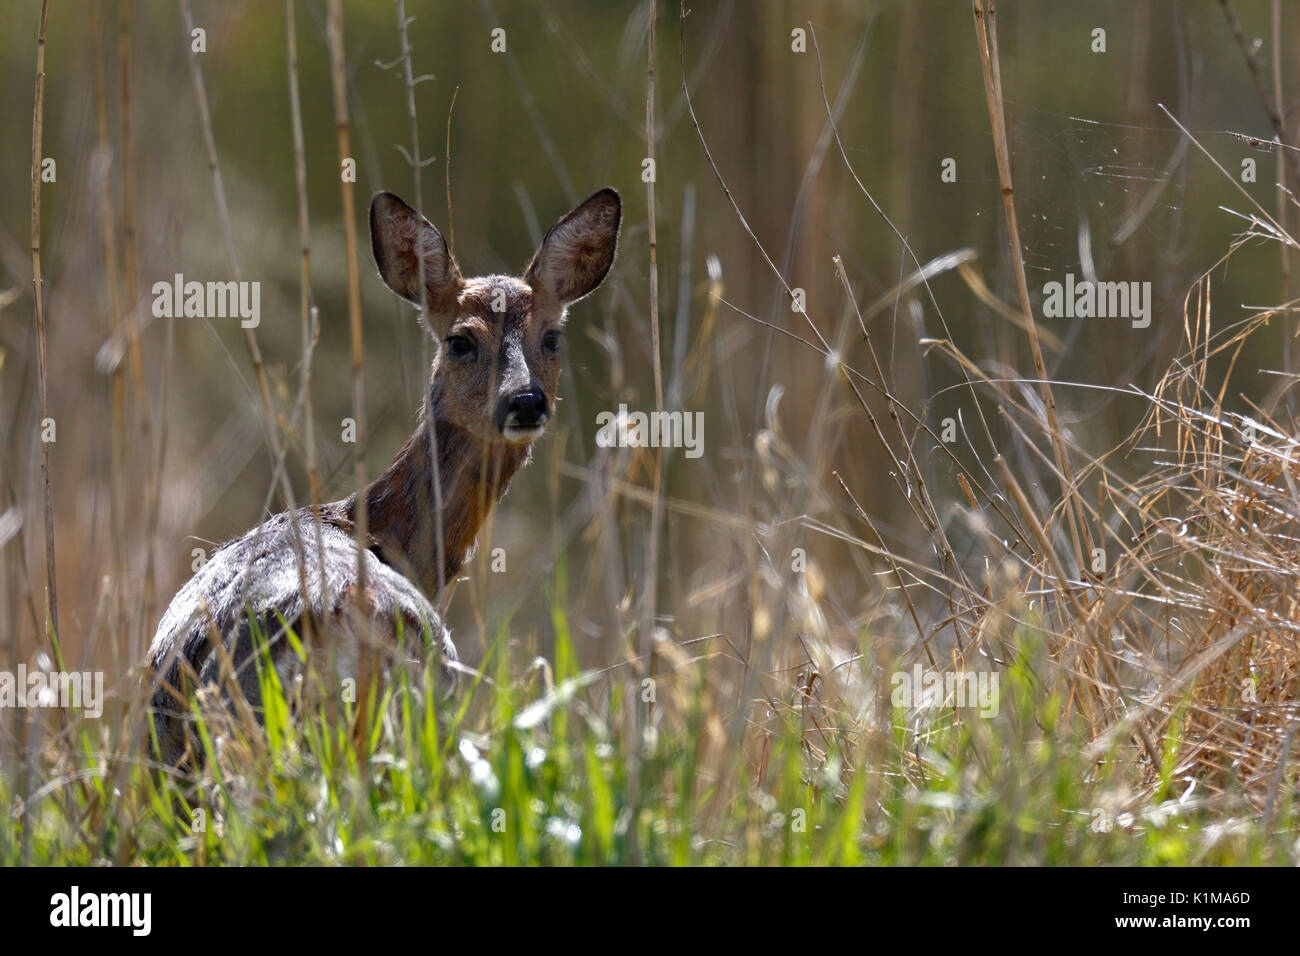 Alert deer (Capreolus capreolus), backlit, Naturpark Flusslandschaft Peenetal, Mecklenburg-Western Pomerania, Germany - Stock Image